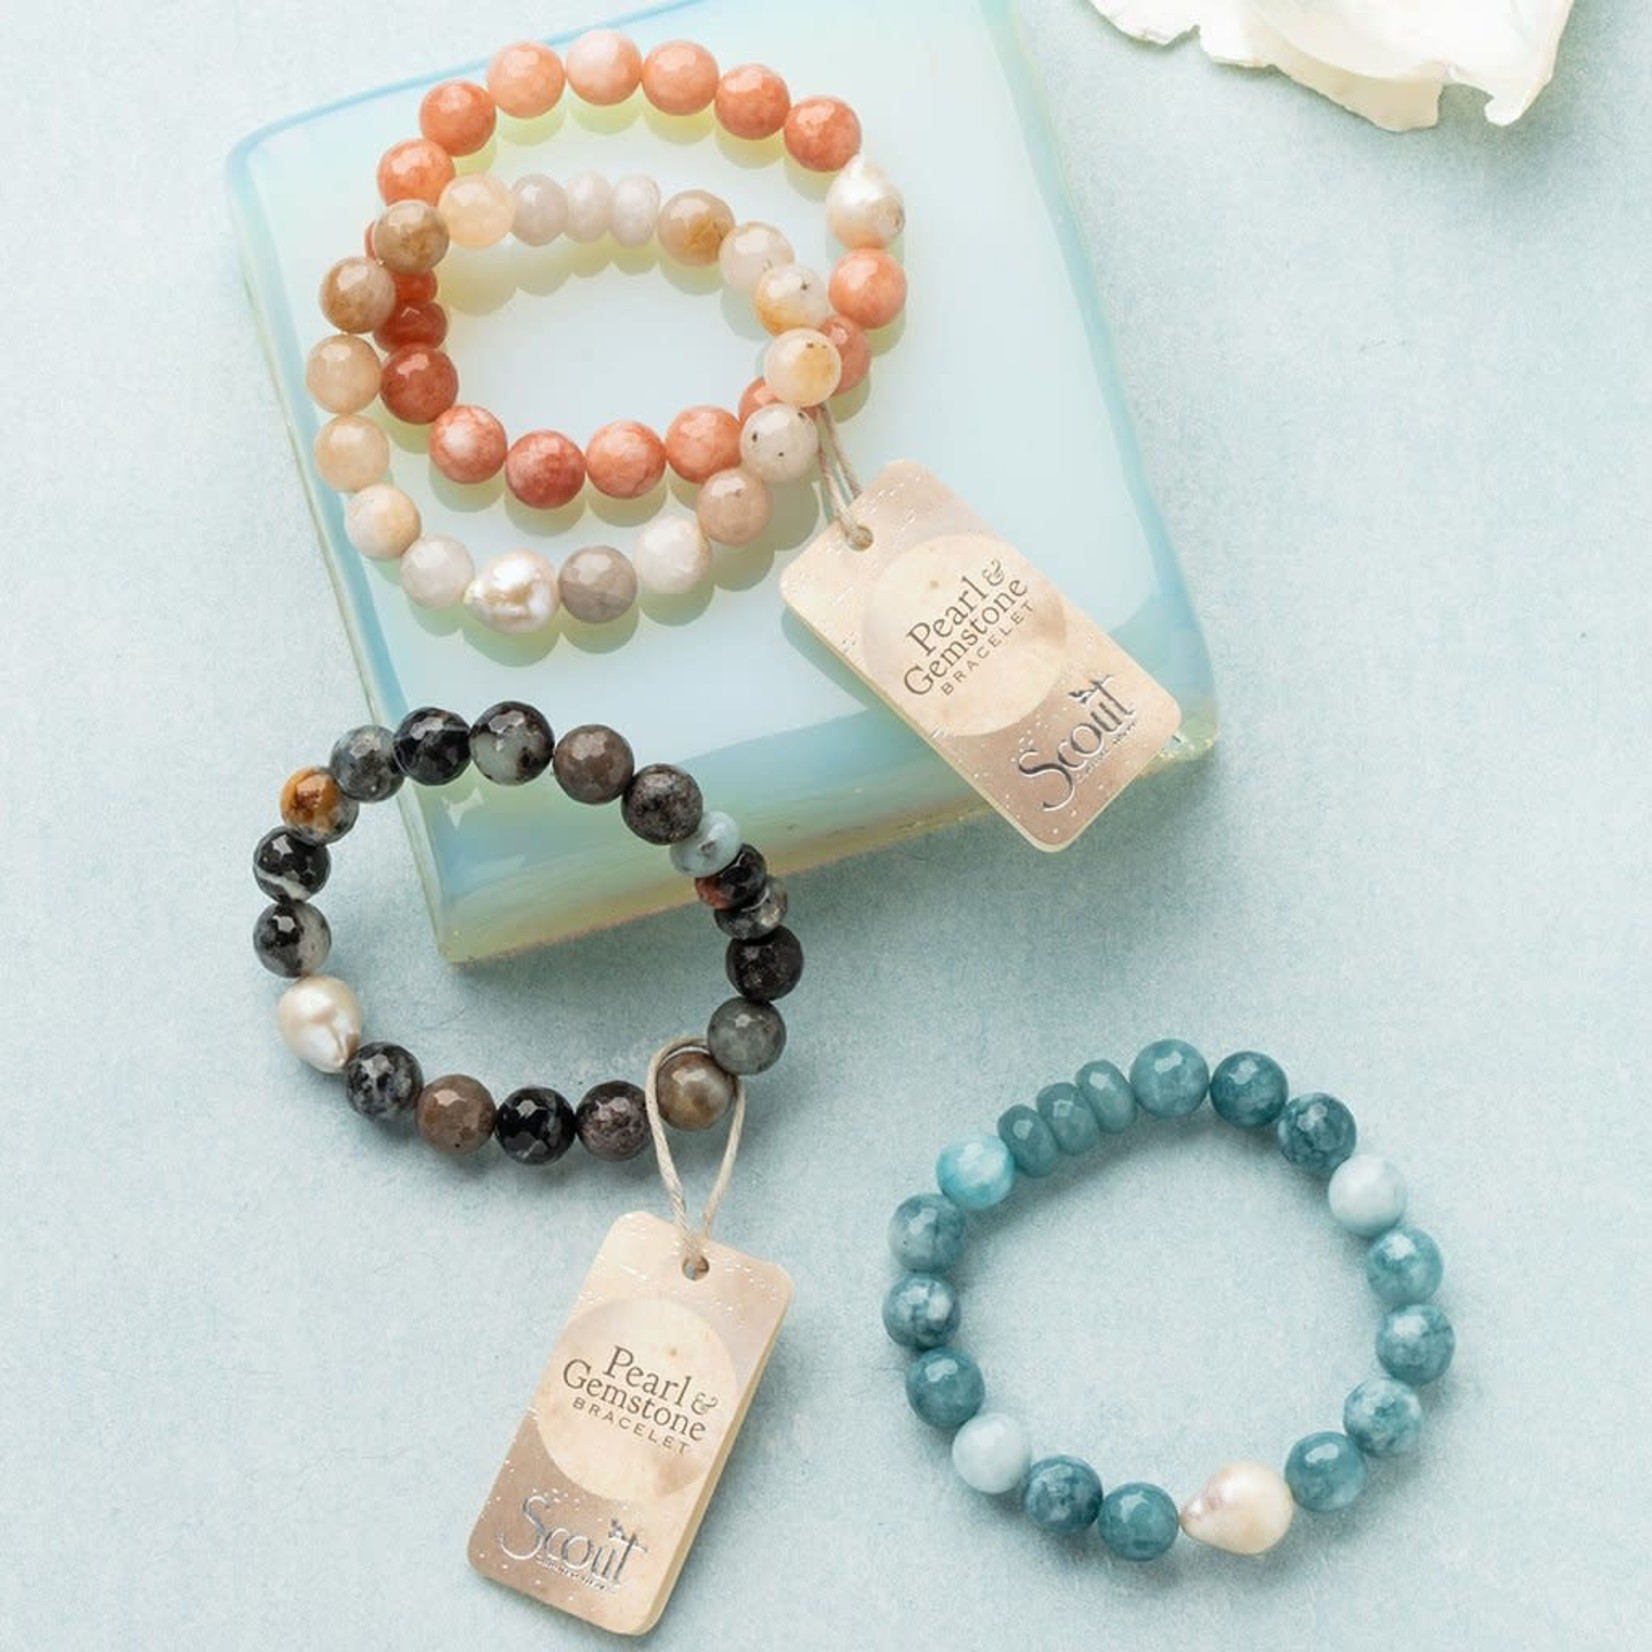 Scout PB003 Pearl & Gemstone Bracelet - Light Blue Agate